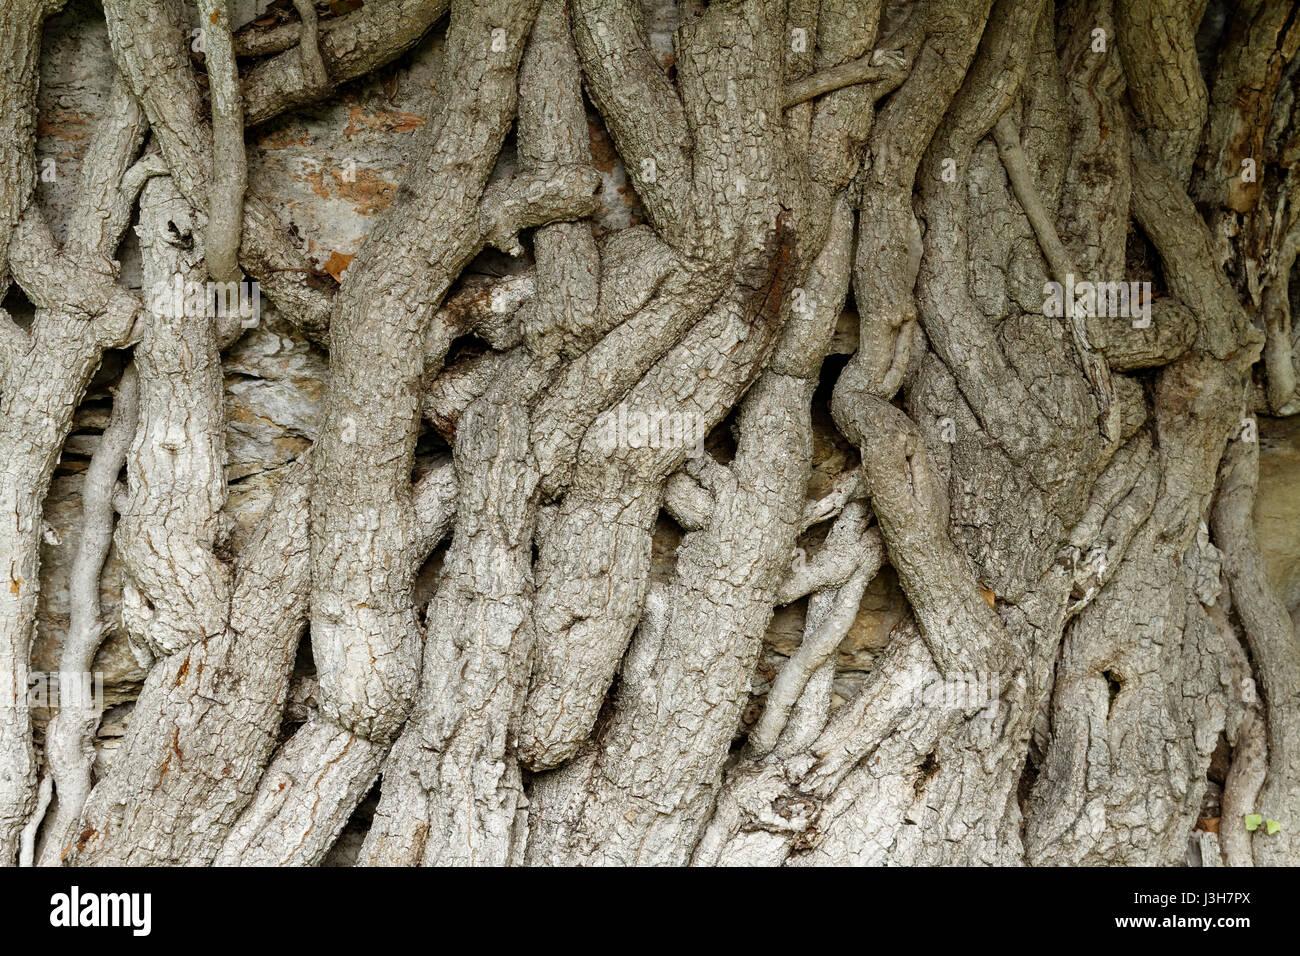 common ivy from Brijuni National Park - Stock Image